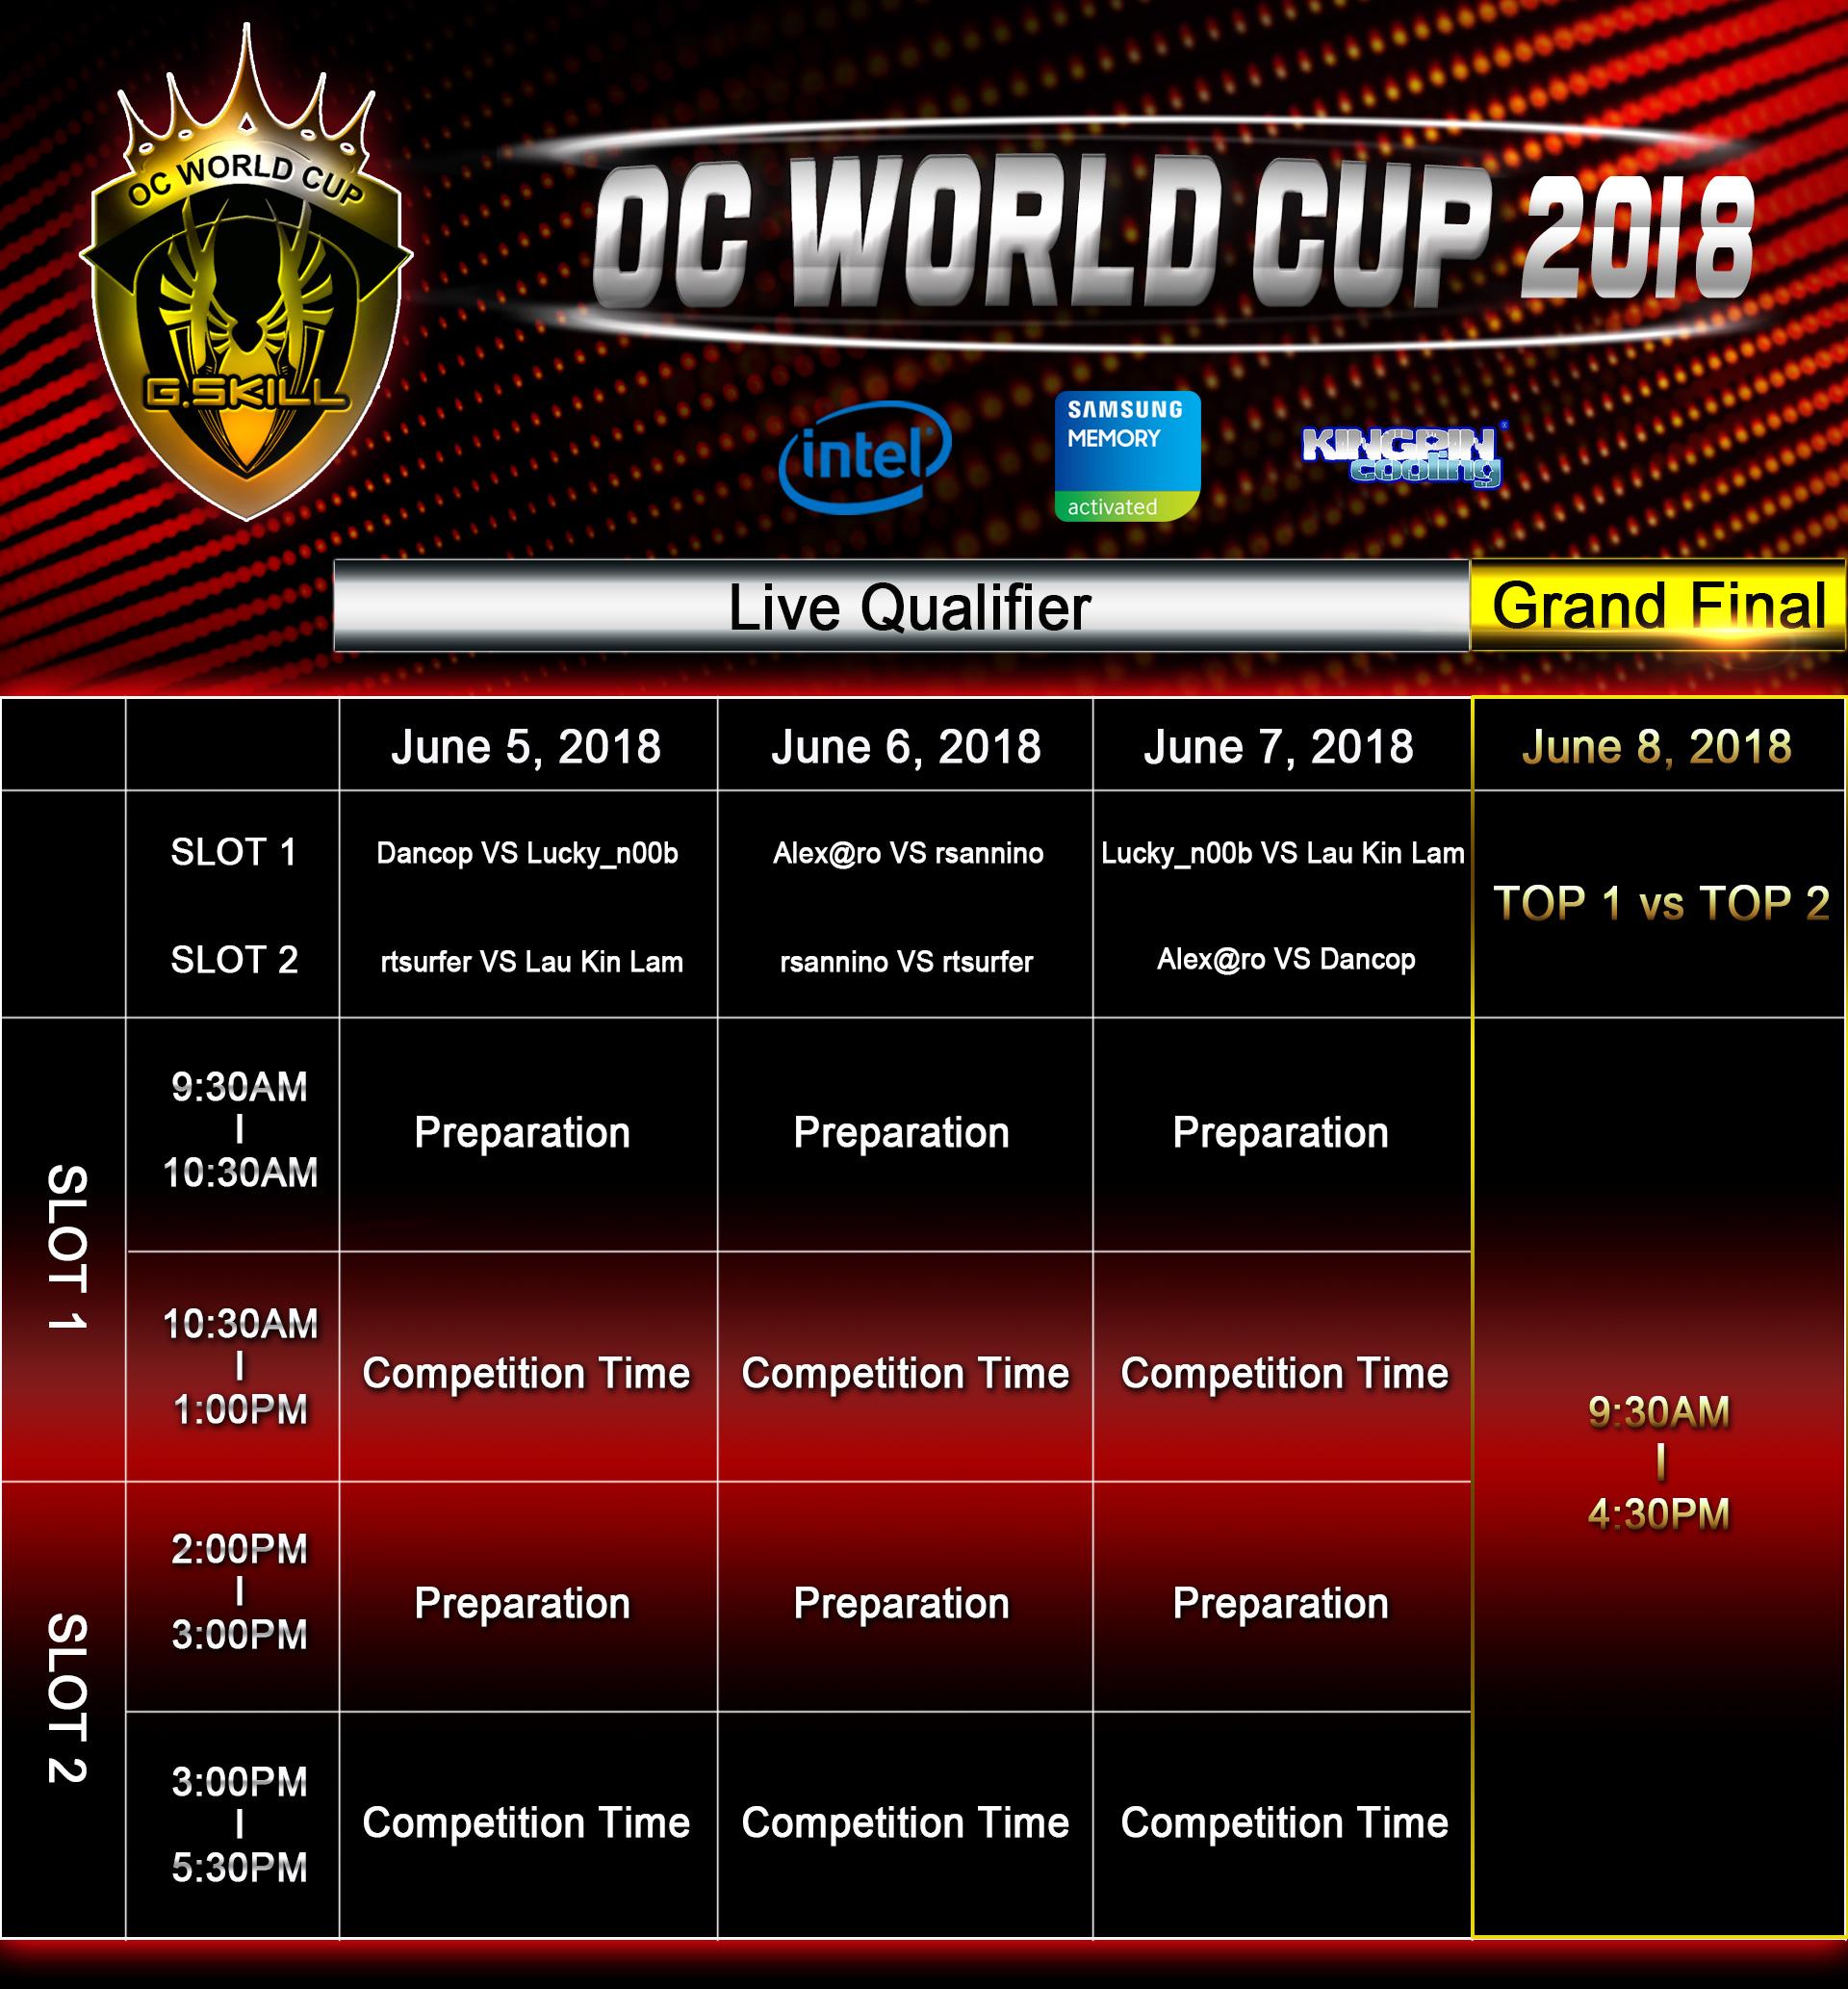 04 oc world cup 2018 schedule G.SKILL เชิญชมงานแข่งขัน Overclocking Events และการม๊อดเคส Mod Showcase ในงาน Computex 2018